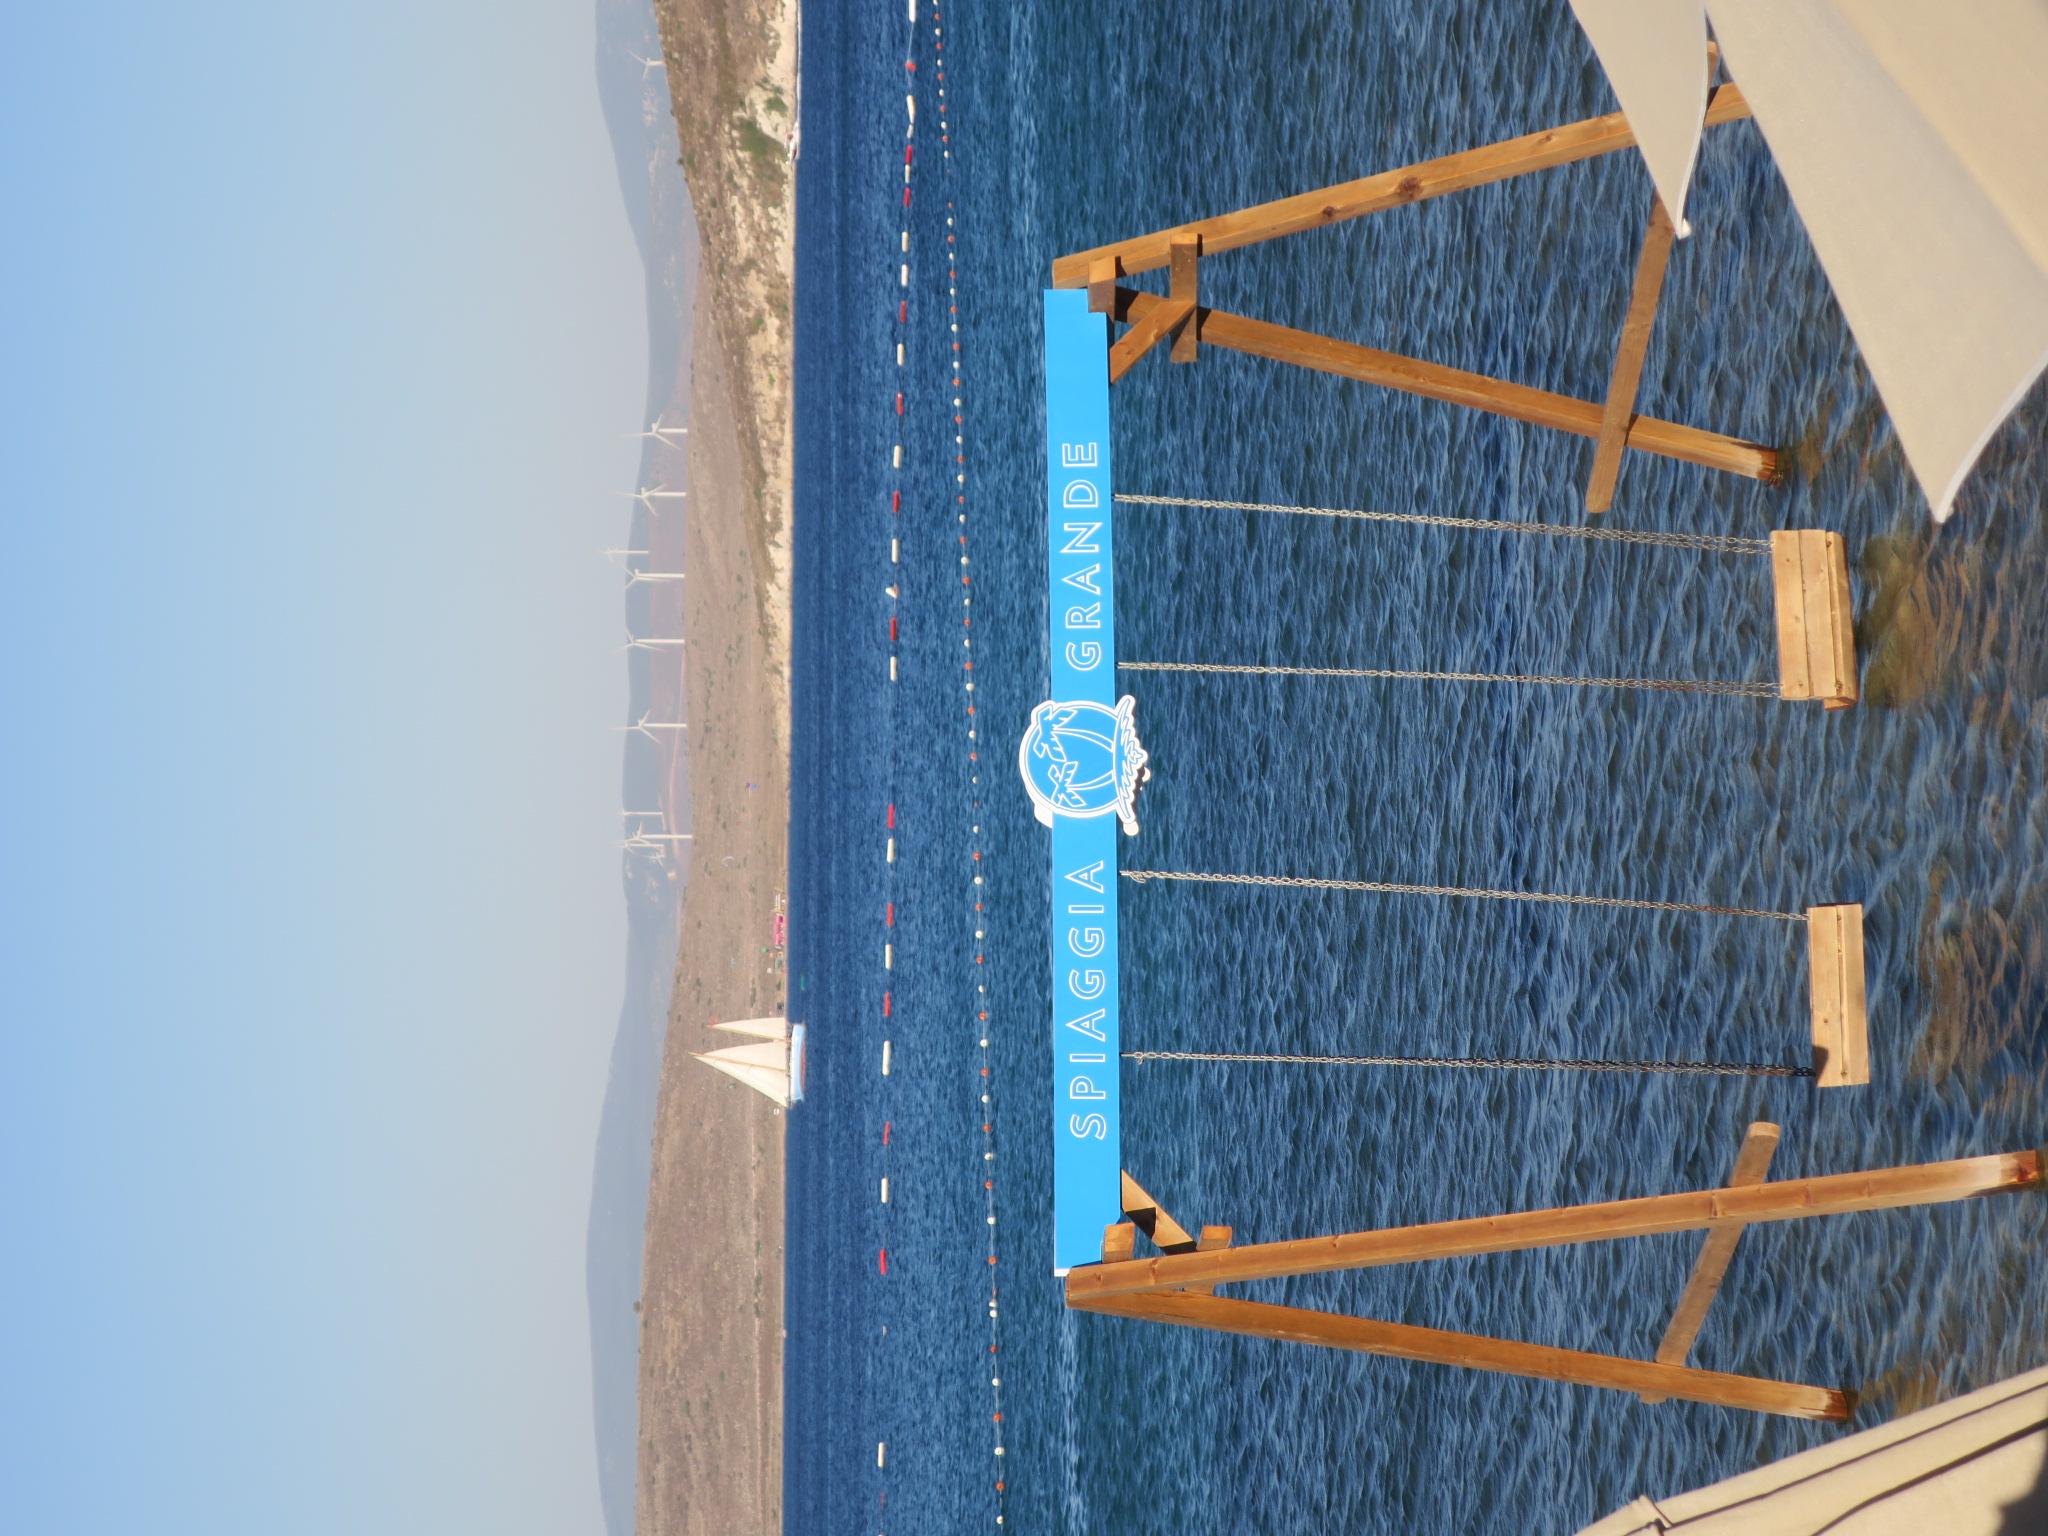 SpiaggiaGrande